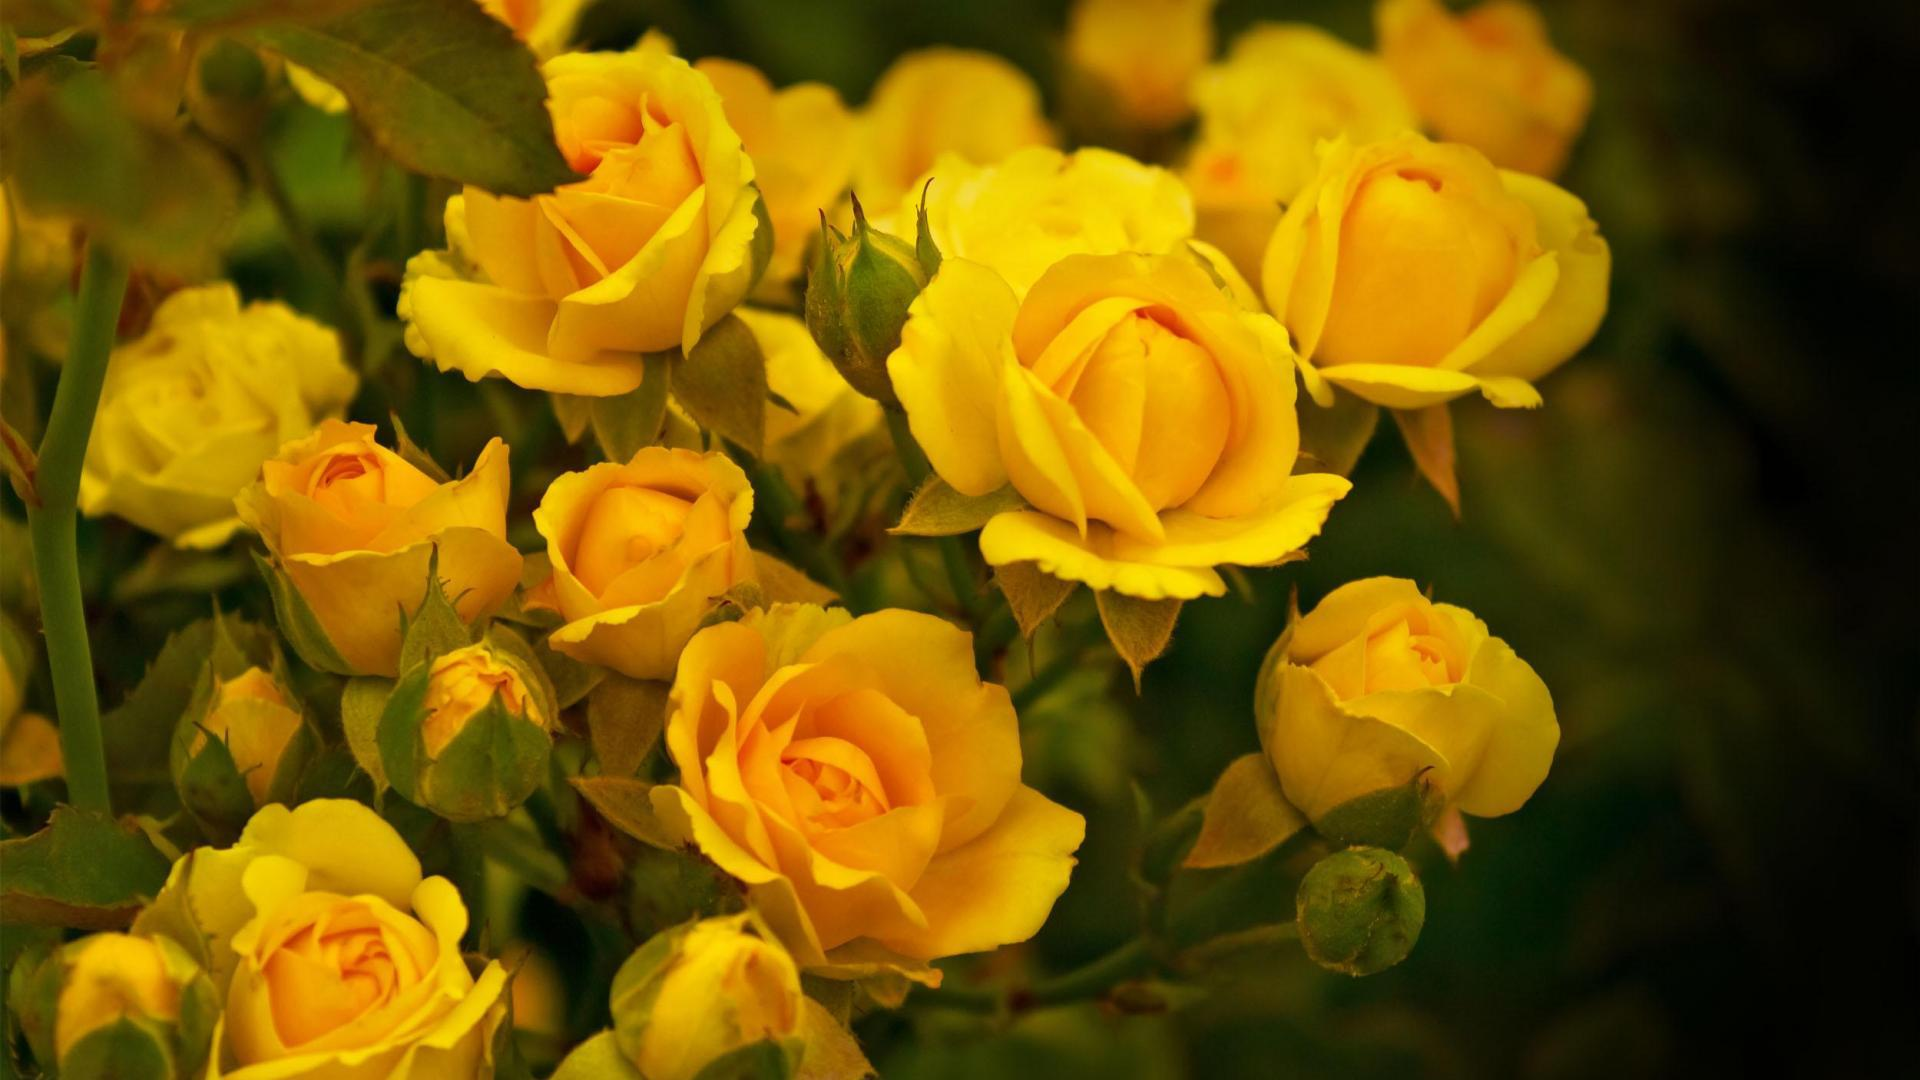 Free photo beautiful yellow flower yellow flower beautiful beautiful yellow flower izmirmasajfo